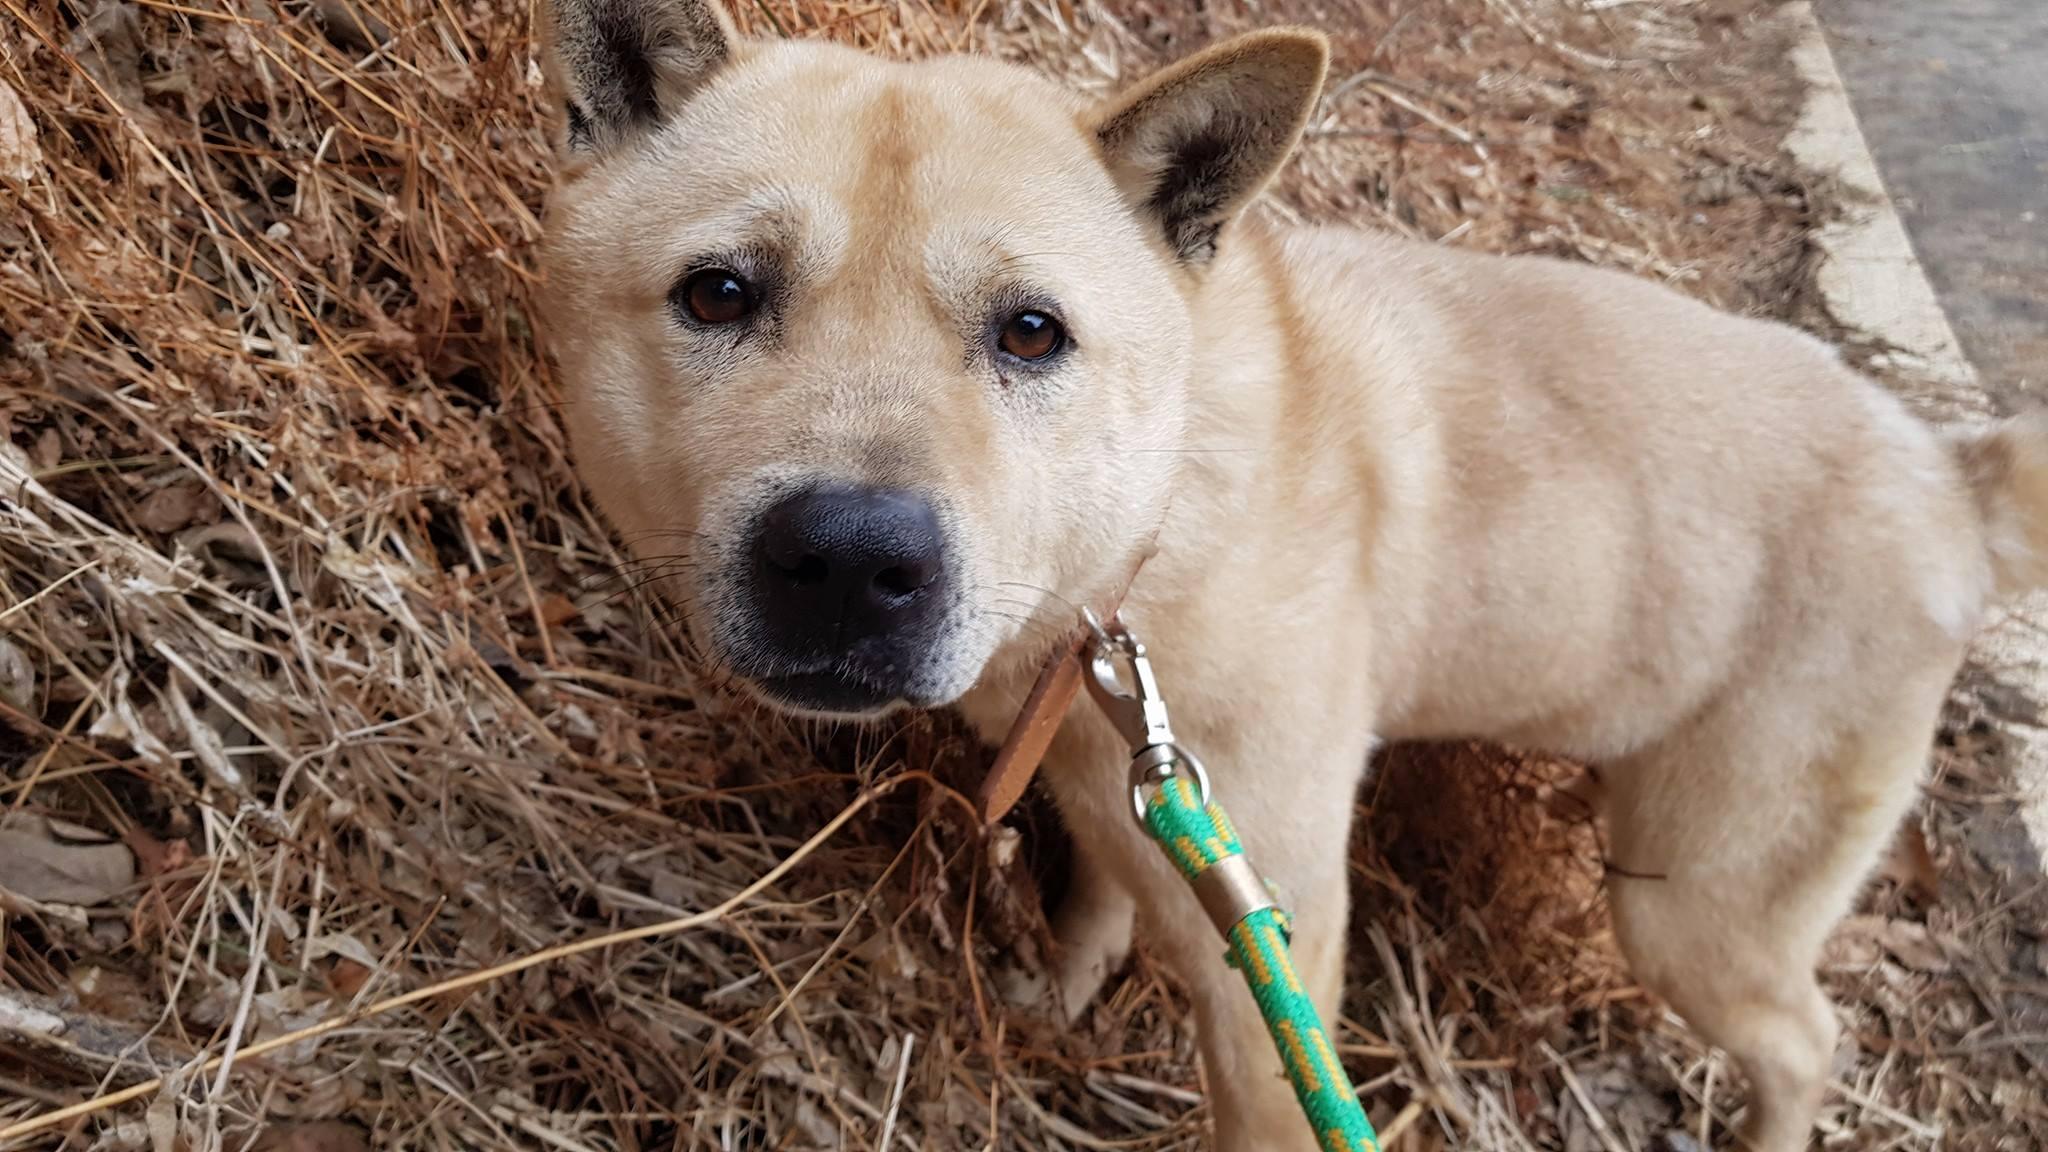 http://savekoreandogs.org/dogs-available-for-adoption/?utm_source=sendinblue&utm_campaign=Dogs_Slaughterhouses_in_School_Cleanup_Zone!___Milwaukee__Daegu_Sister_City&utm_medium=email